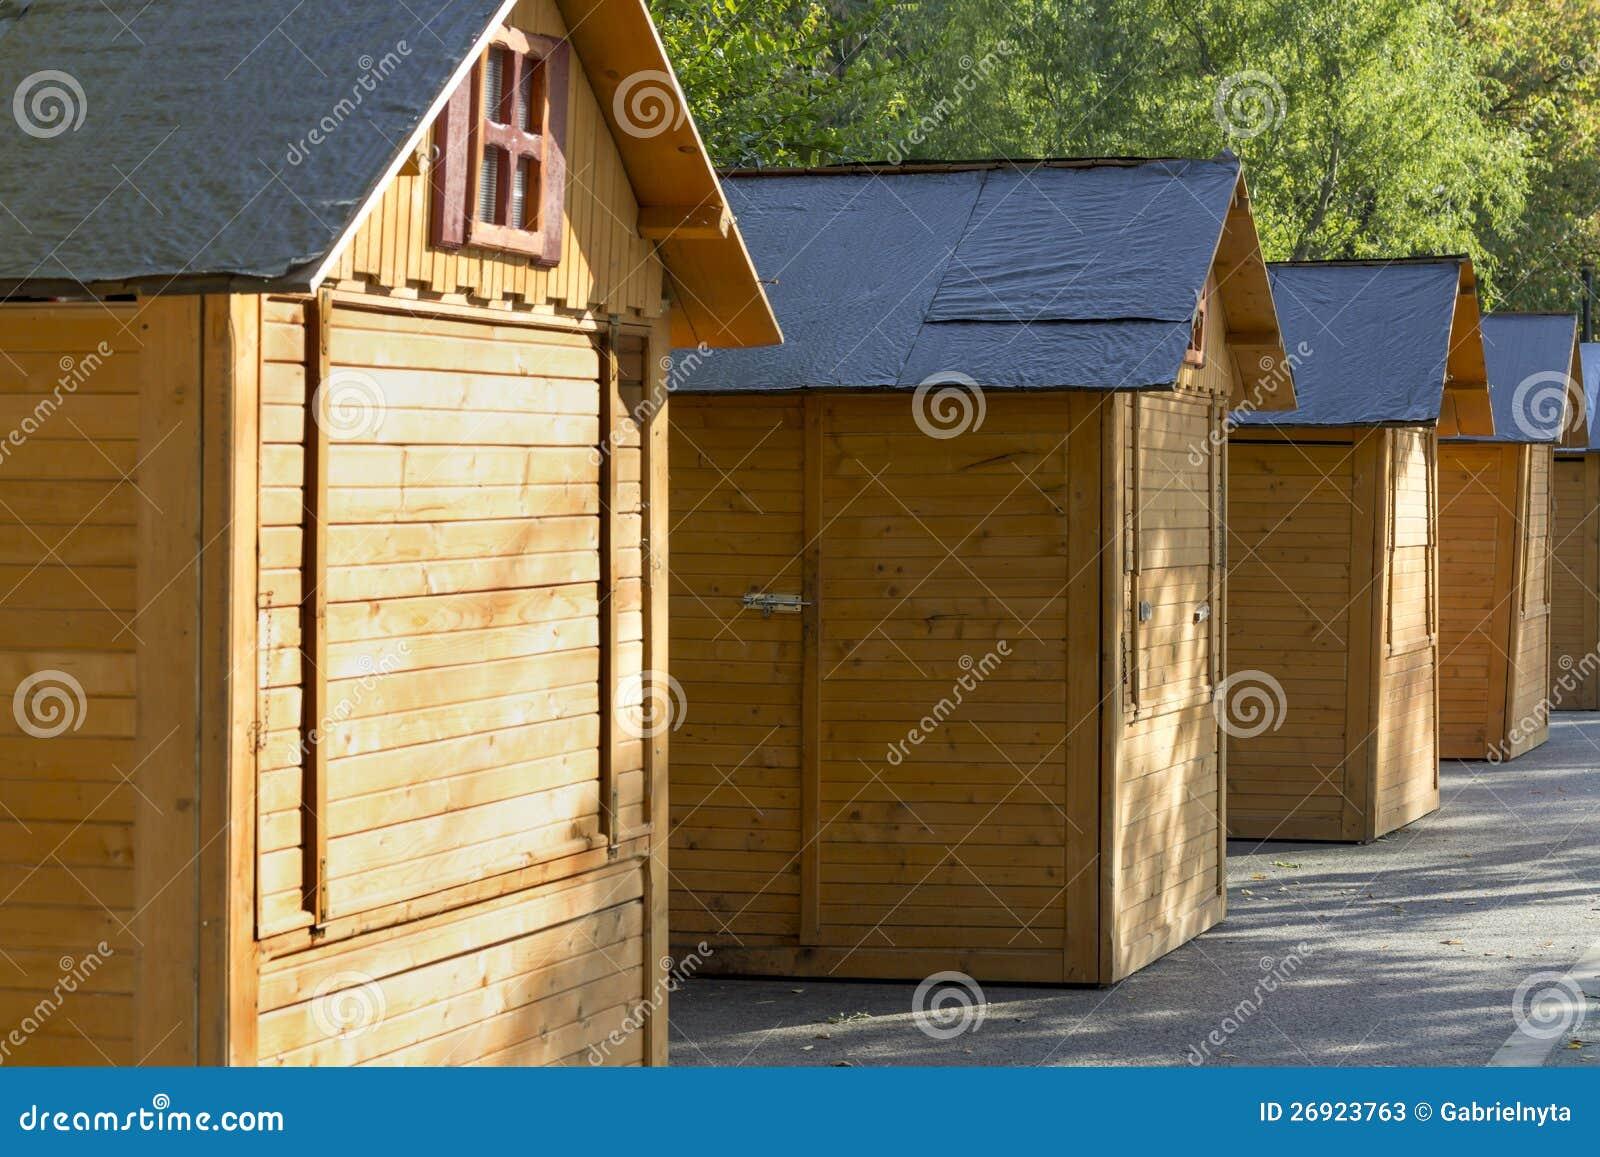 Peque as casas de madera fotos de archivo imagen 26923763 - Casa pequena de madera ...